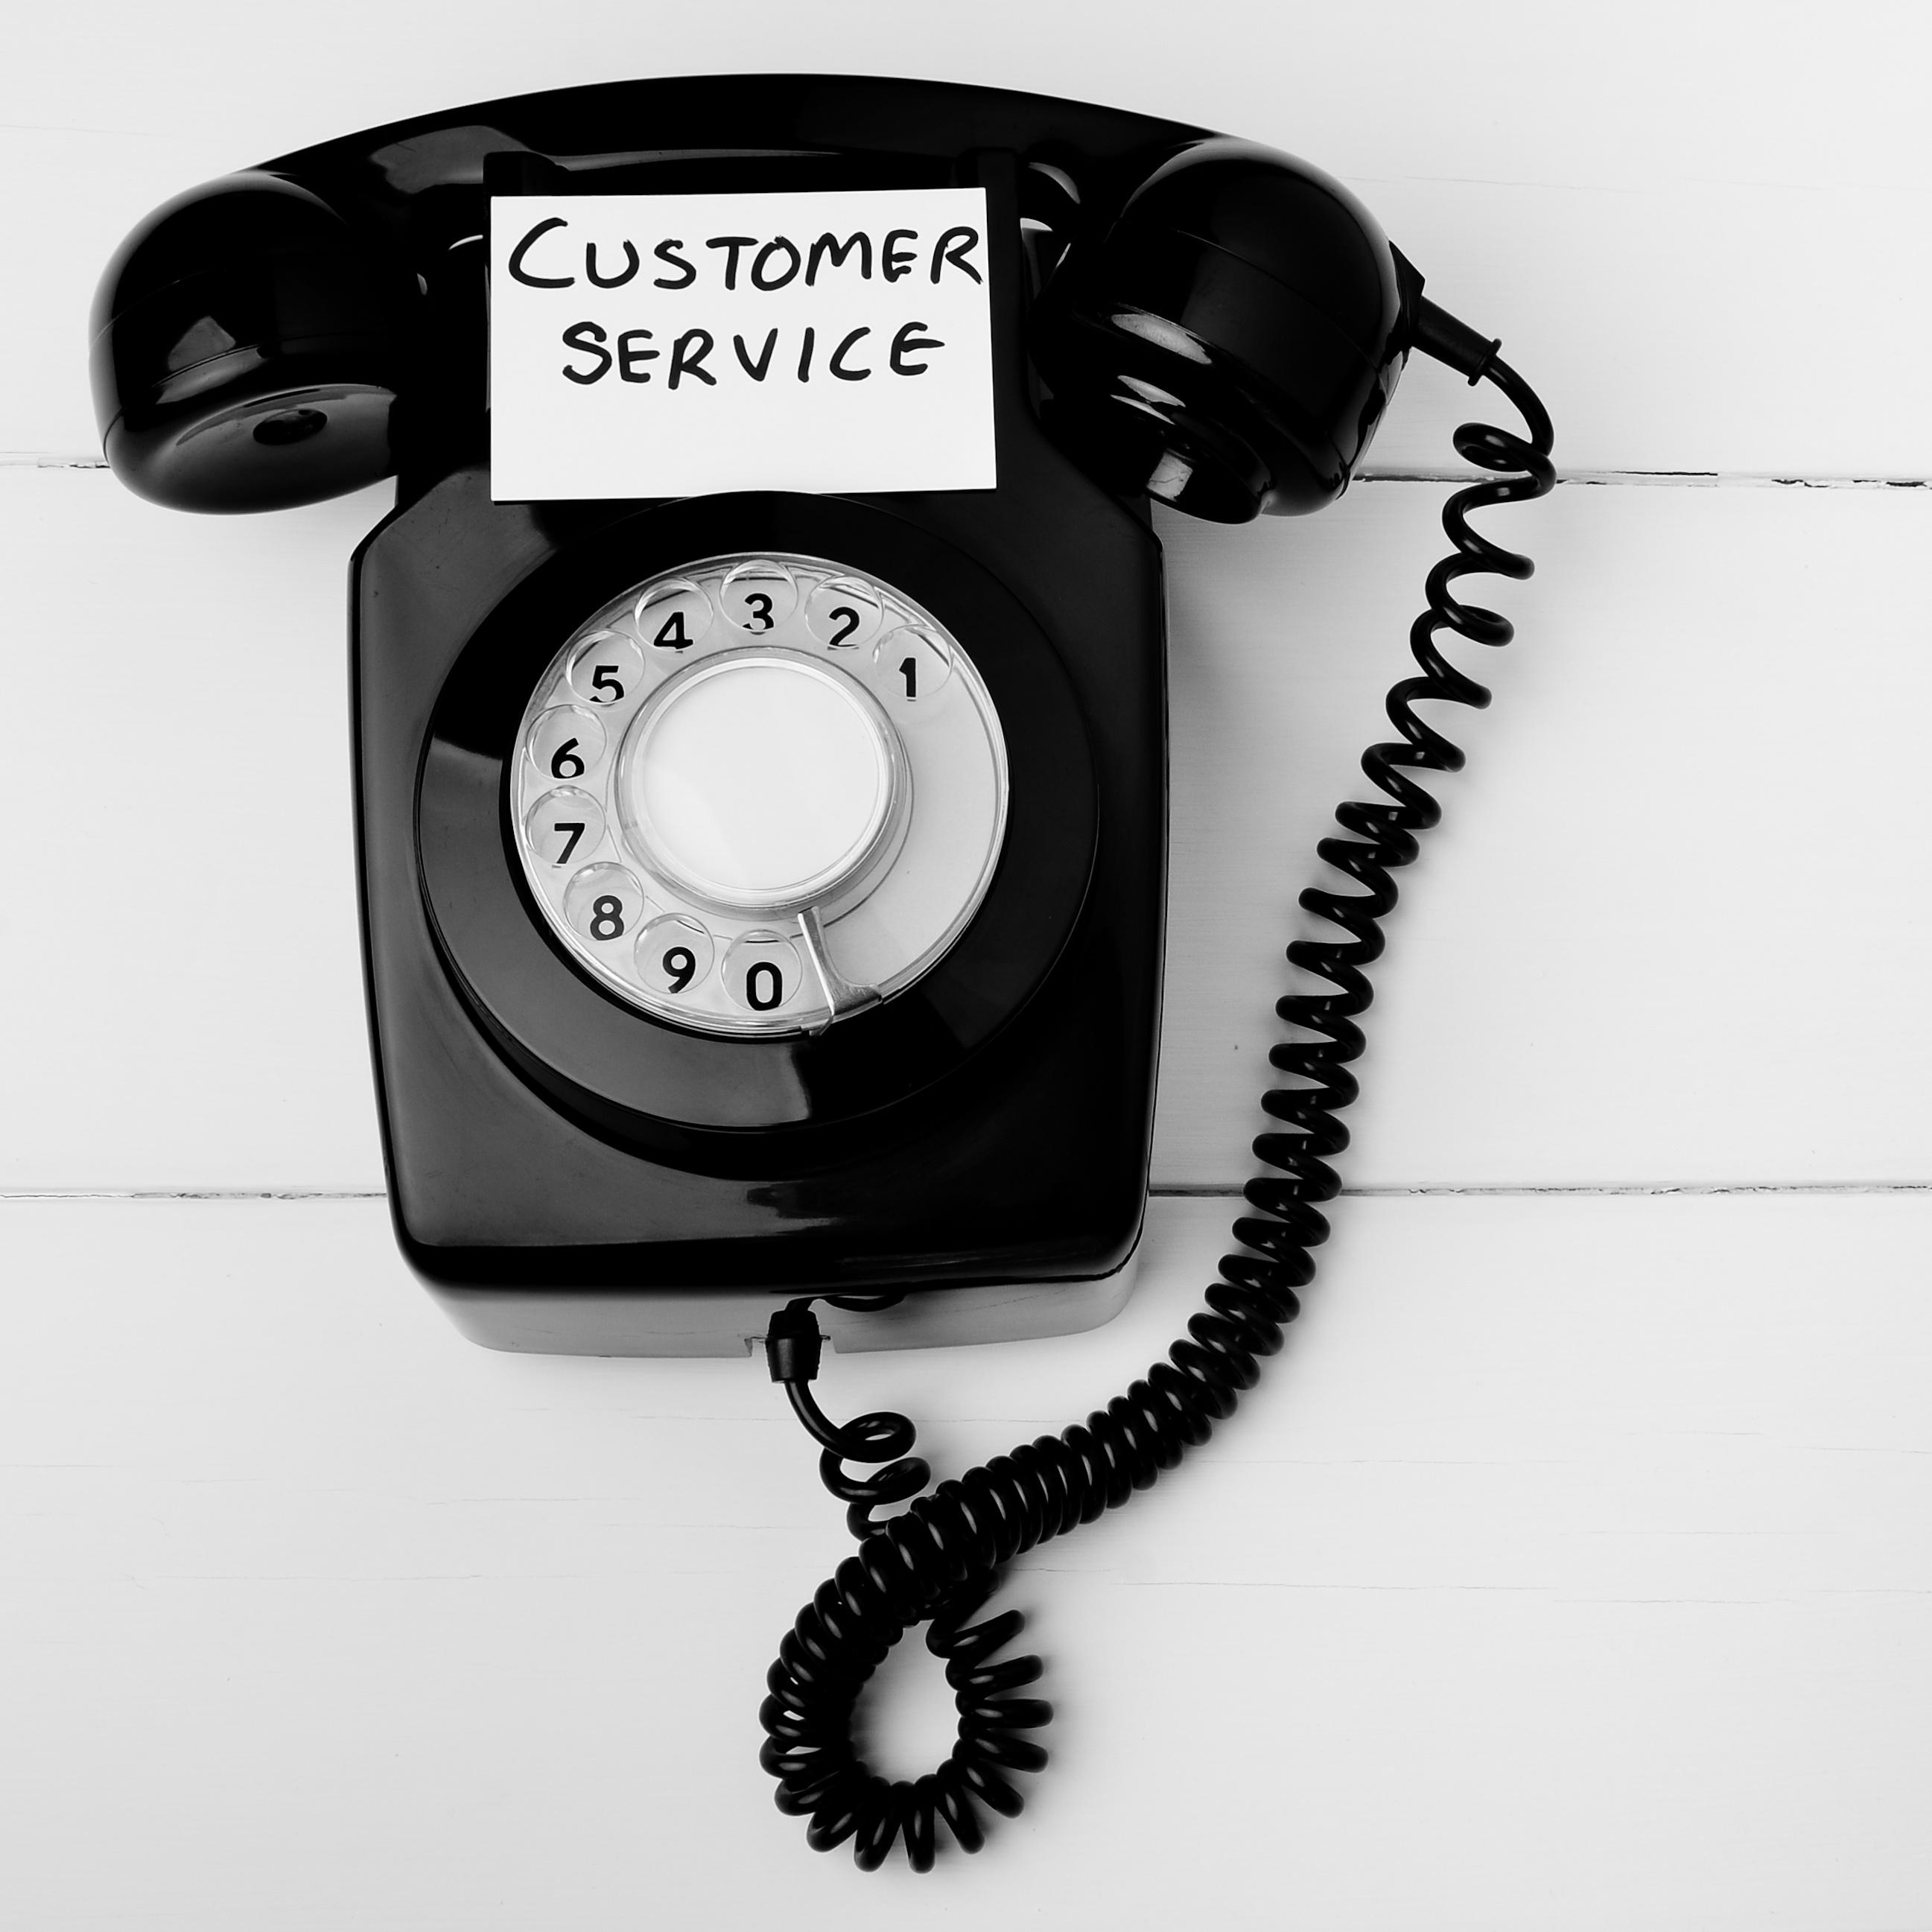 Old fashioned customer service concept